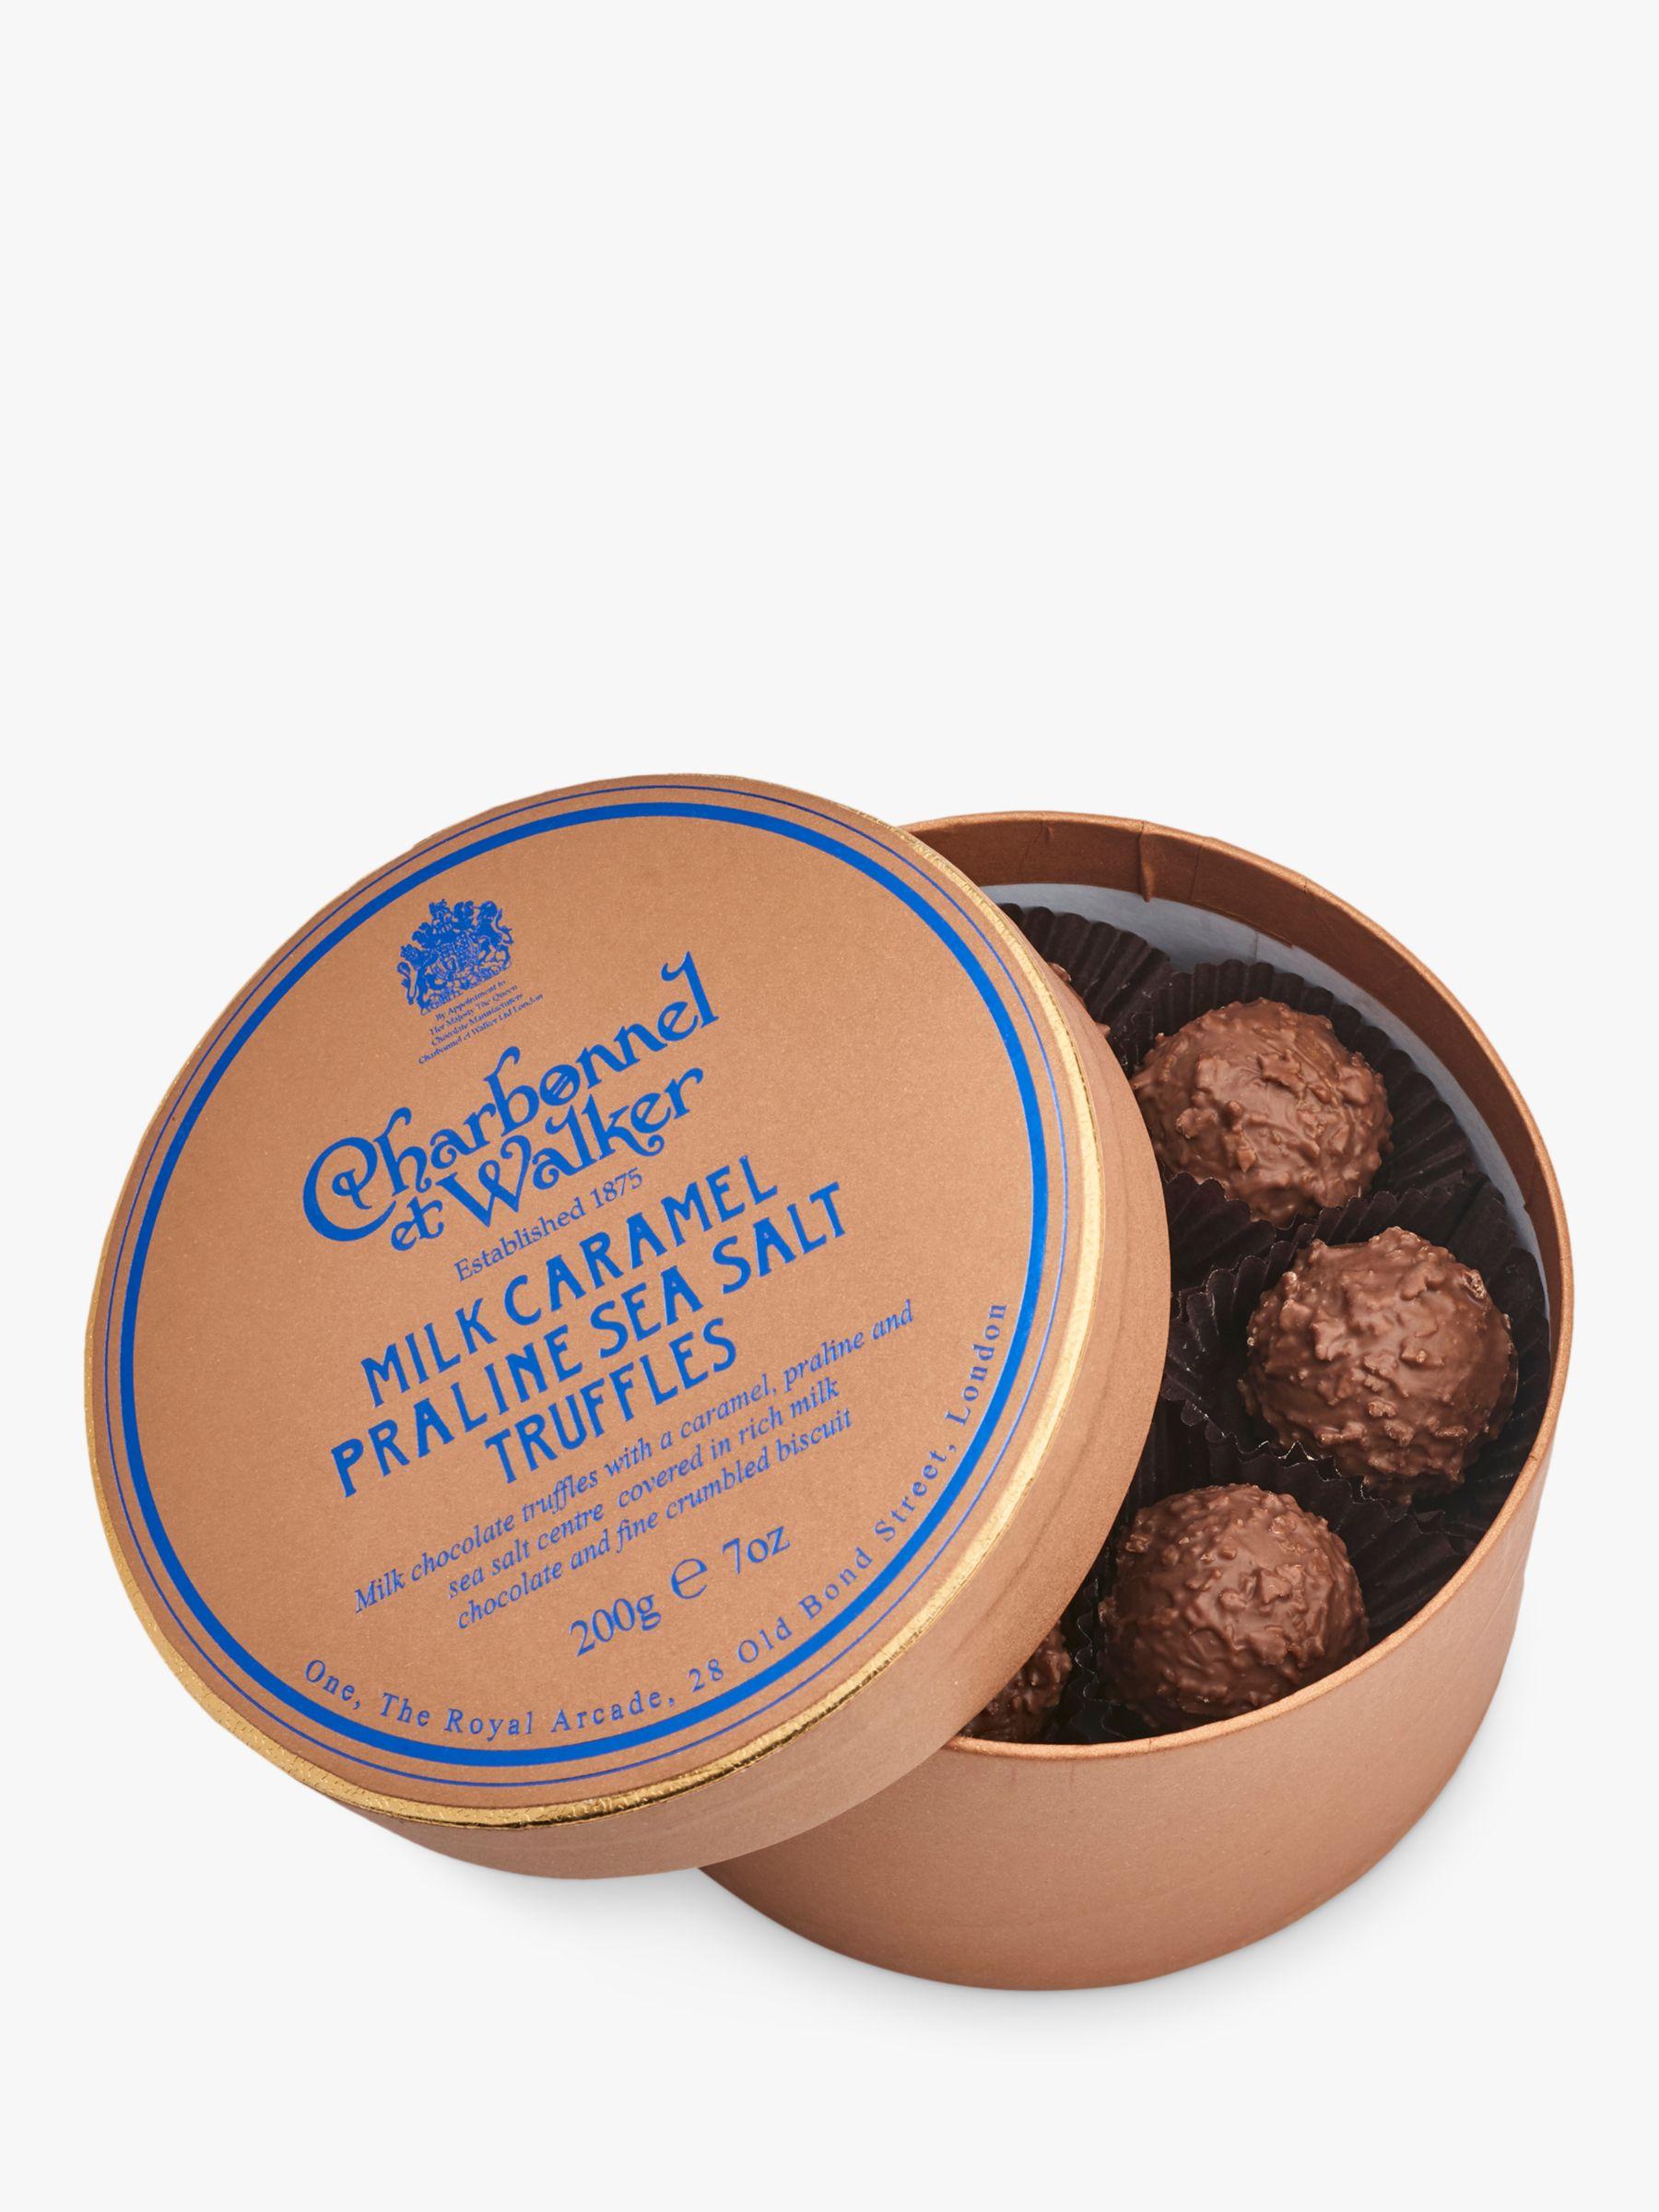 Charbonnel et Walker Charbonnel et Walker Milk Caramel Praline Seasalt Truffles, 200g